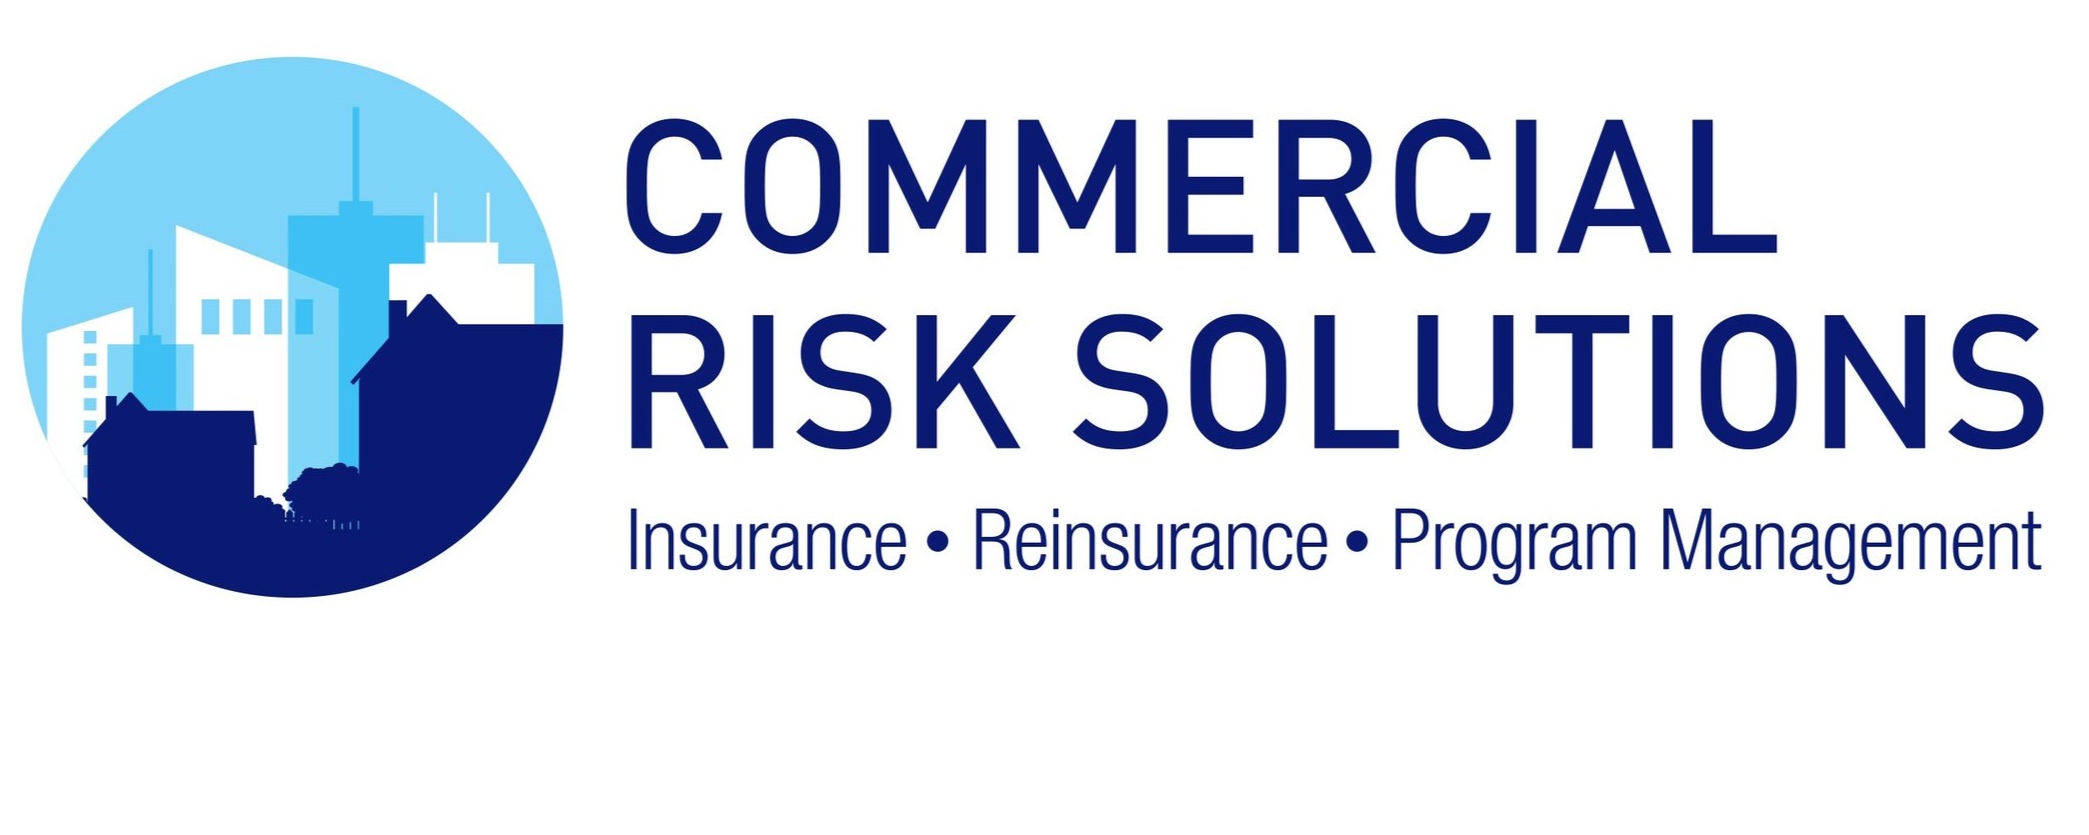 Commercial Risk Solutions.jpg